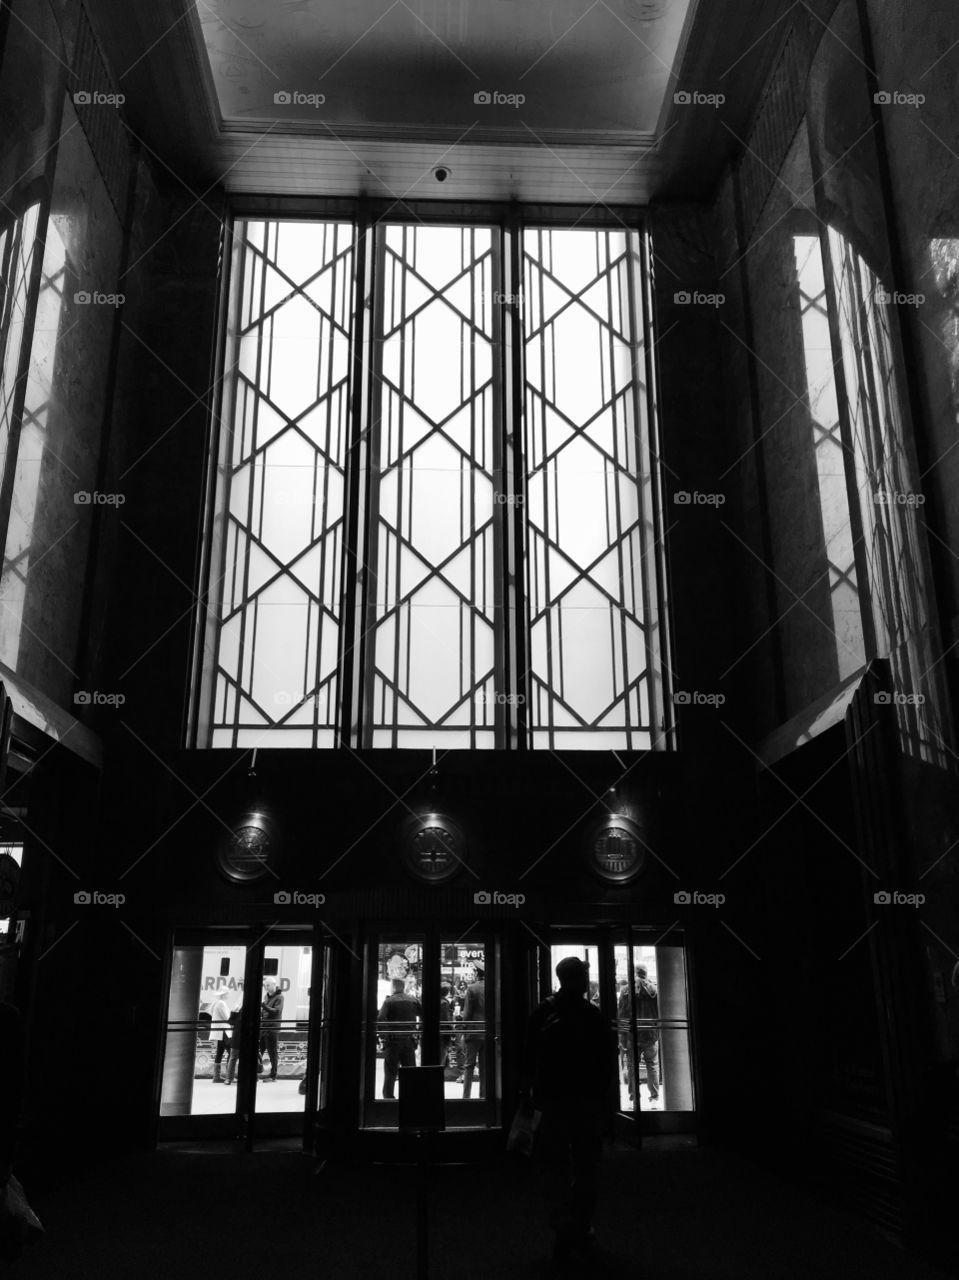 Art Deco windows in the city